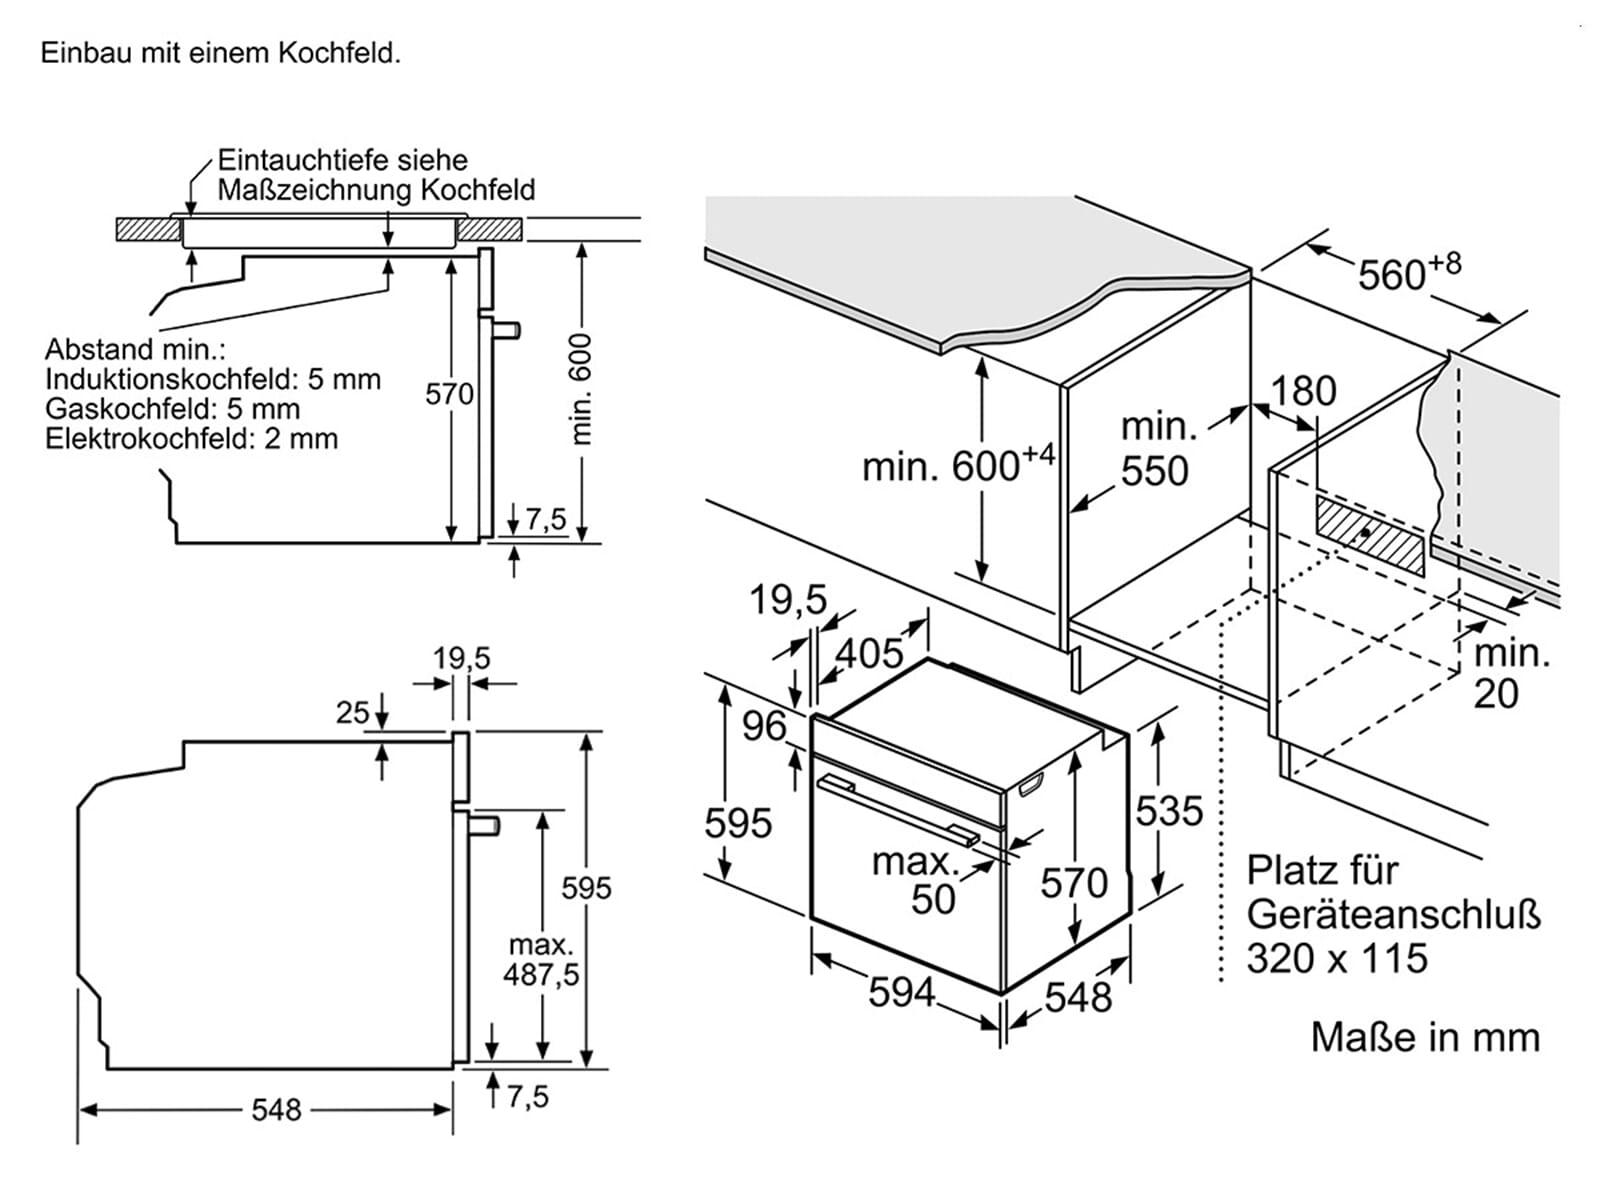 bosch hnd671cs60 set pyrolyse einbauherd hea578bs0 glaskeramikkochfeld nkn645g ebay. Black Bedroom Furniture Sets. Home Design Ideas